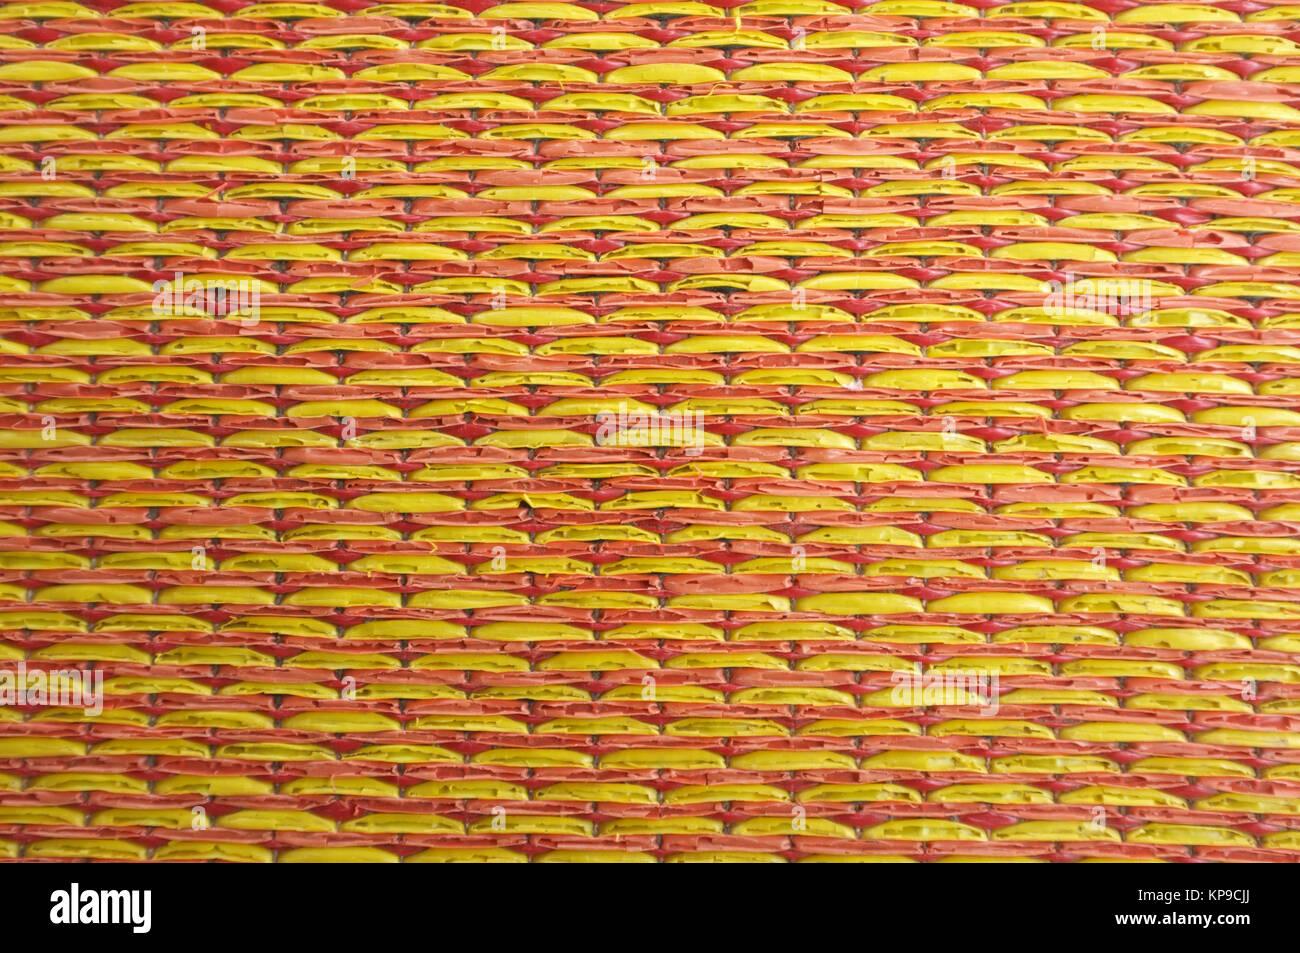 Plastic Woven Mat Stock Photos Amp Plastic Woven Mat Stock